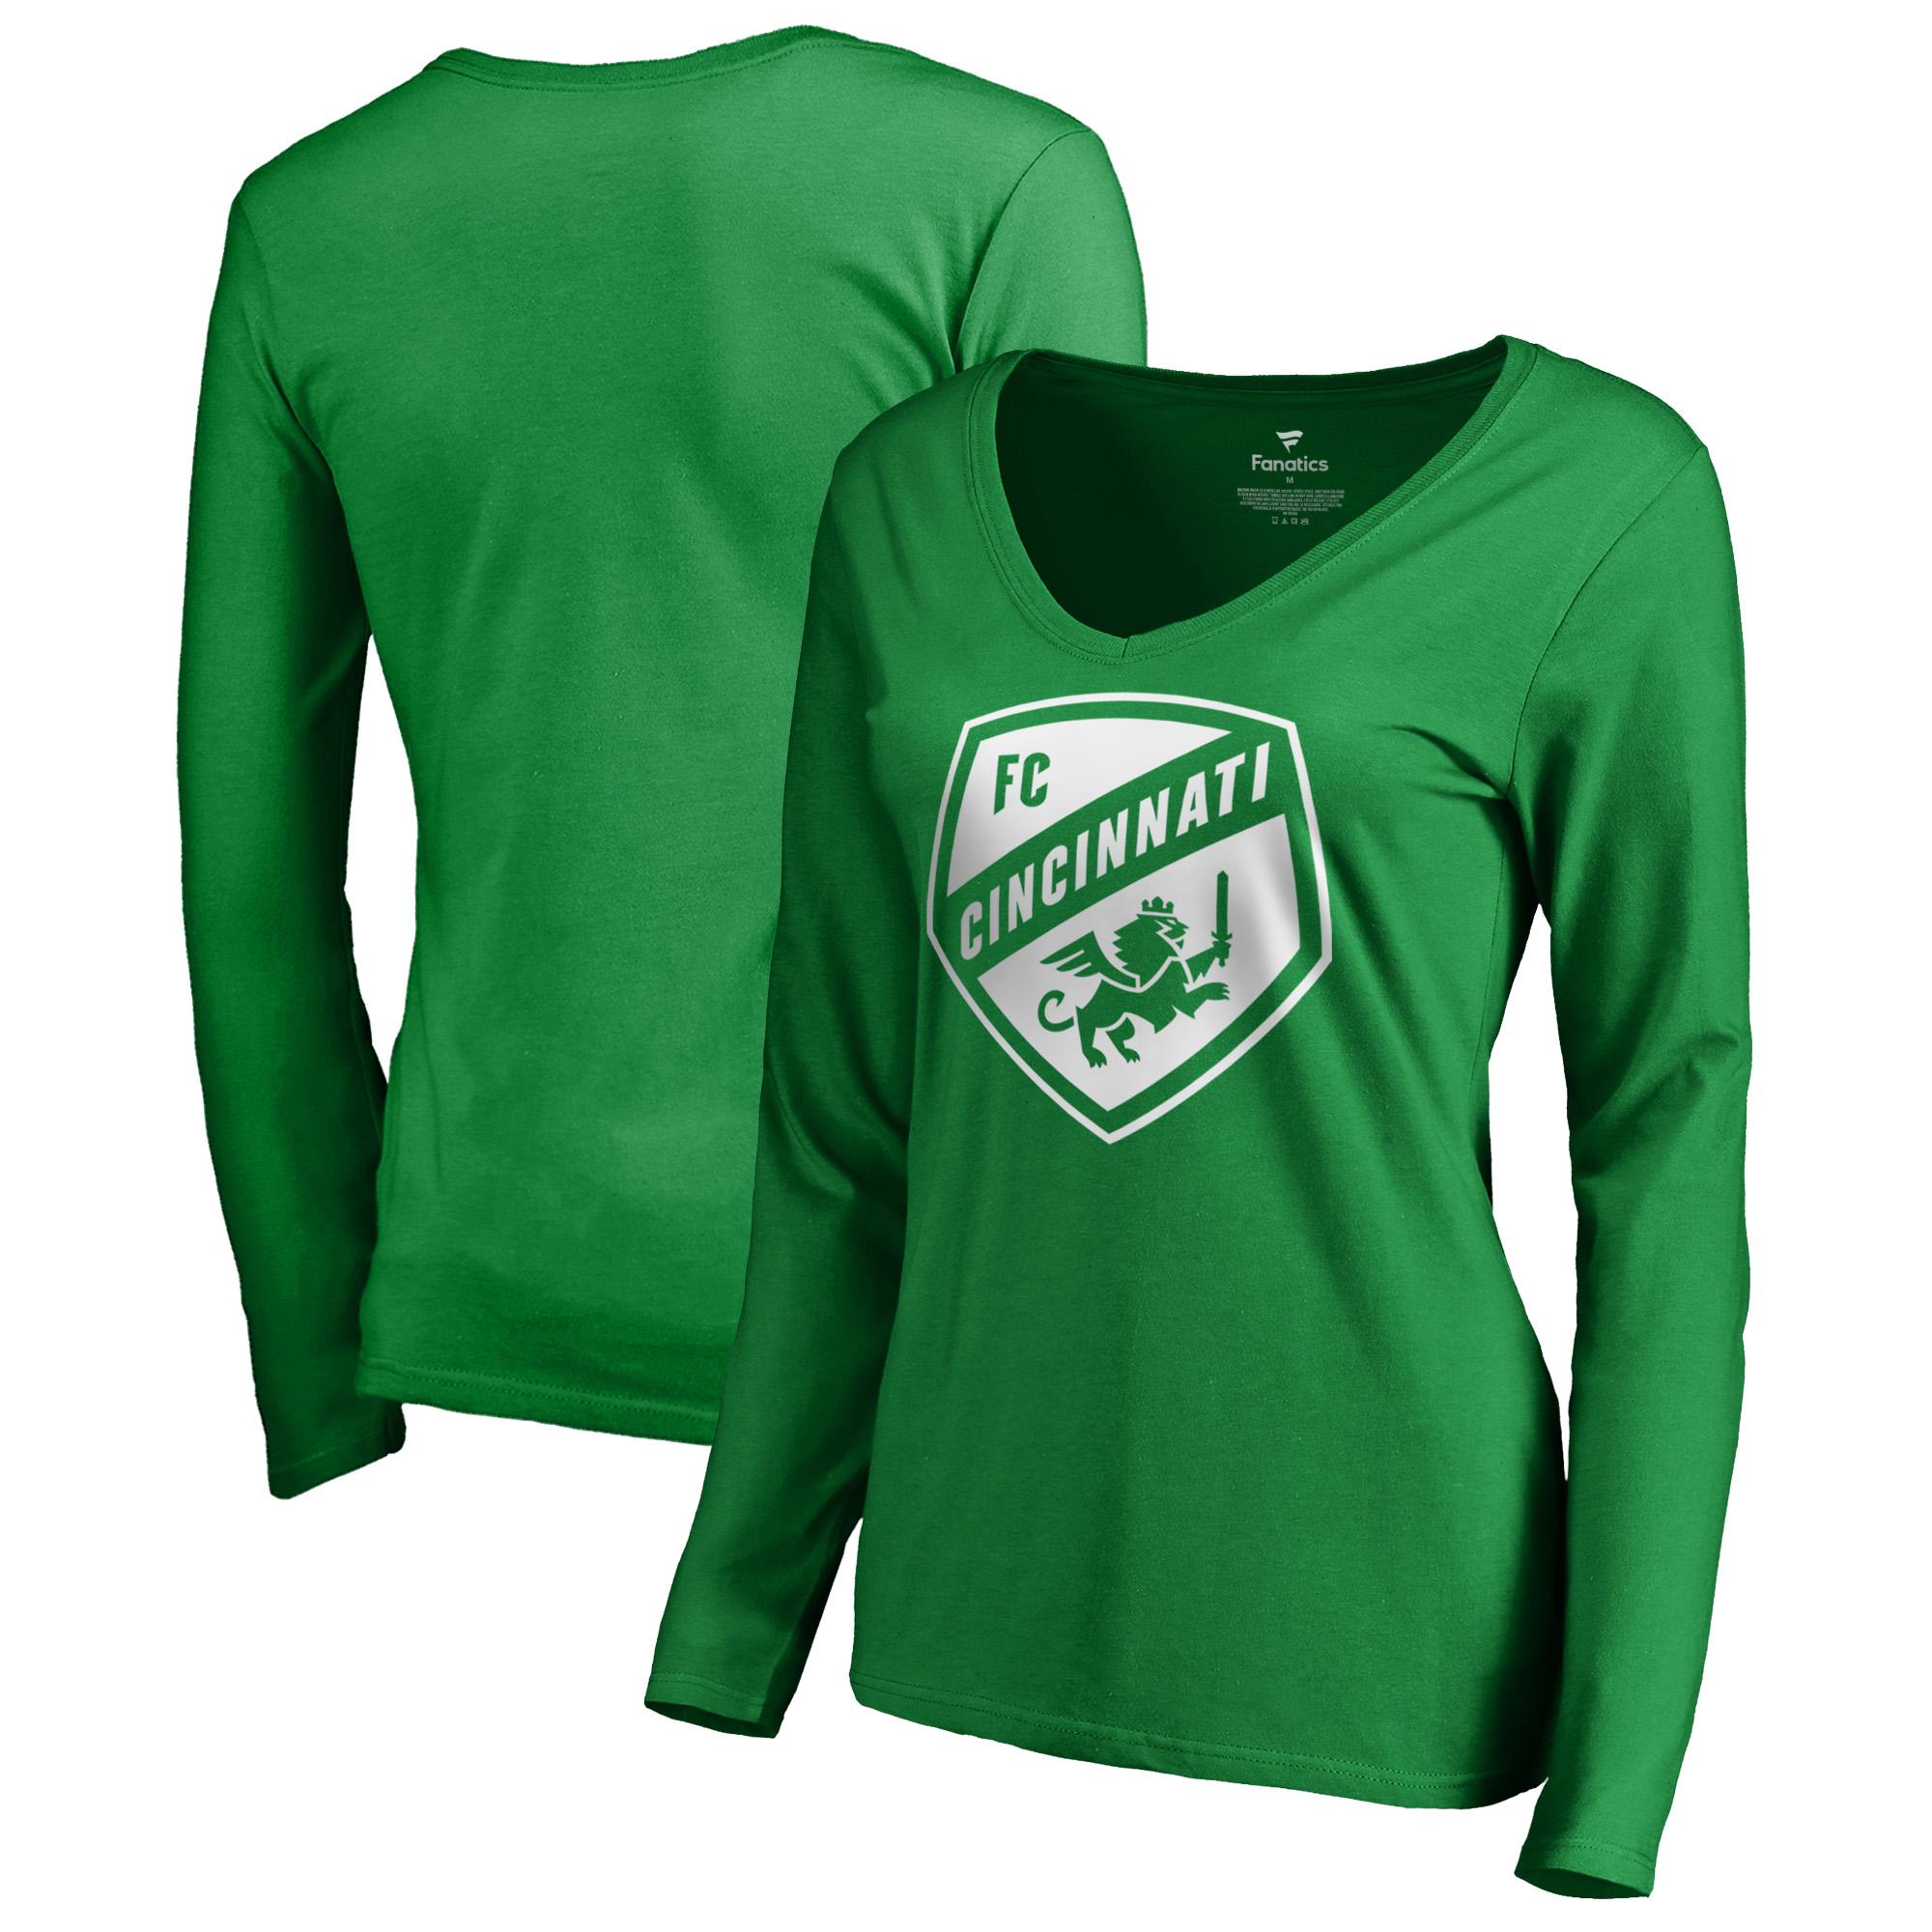 FC Cincinnati Fanatics Branded Women's St. Patrick's Day White Logo Long Sleeve V-Neck T-Shirt - Kelly Green